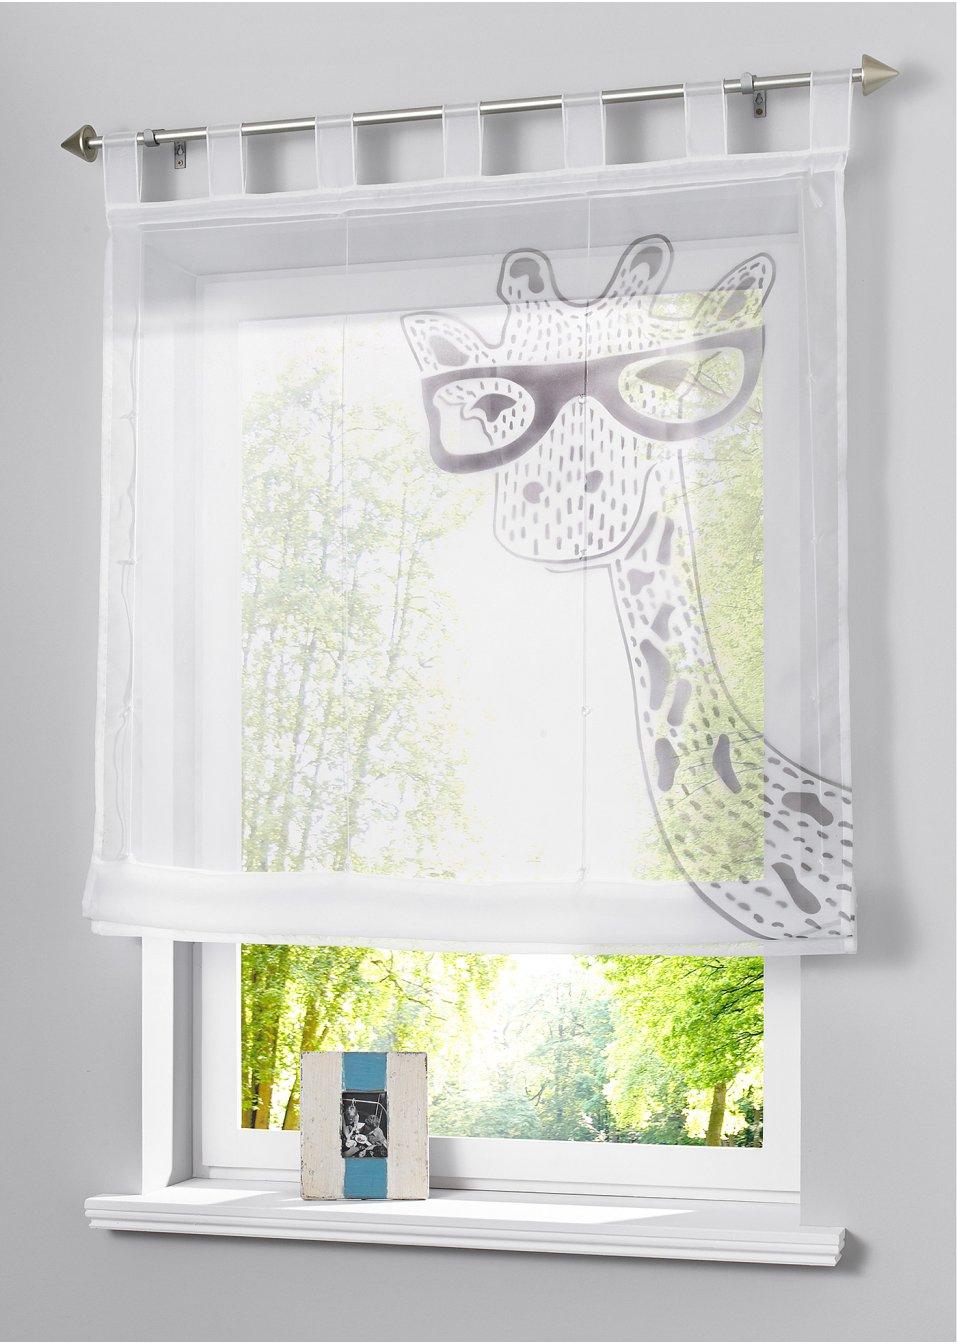 raffrollo giraffe schlaufen grau bpc living. Black Bedroom Furniture Sets. Home Design Ideas